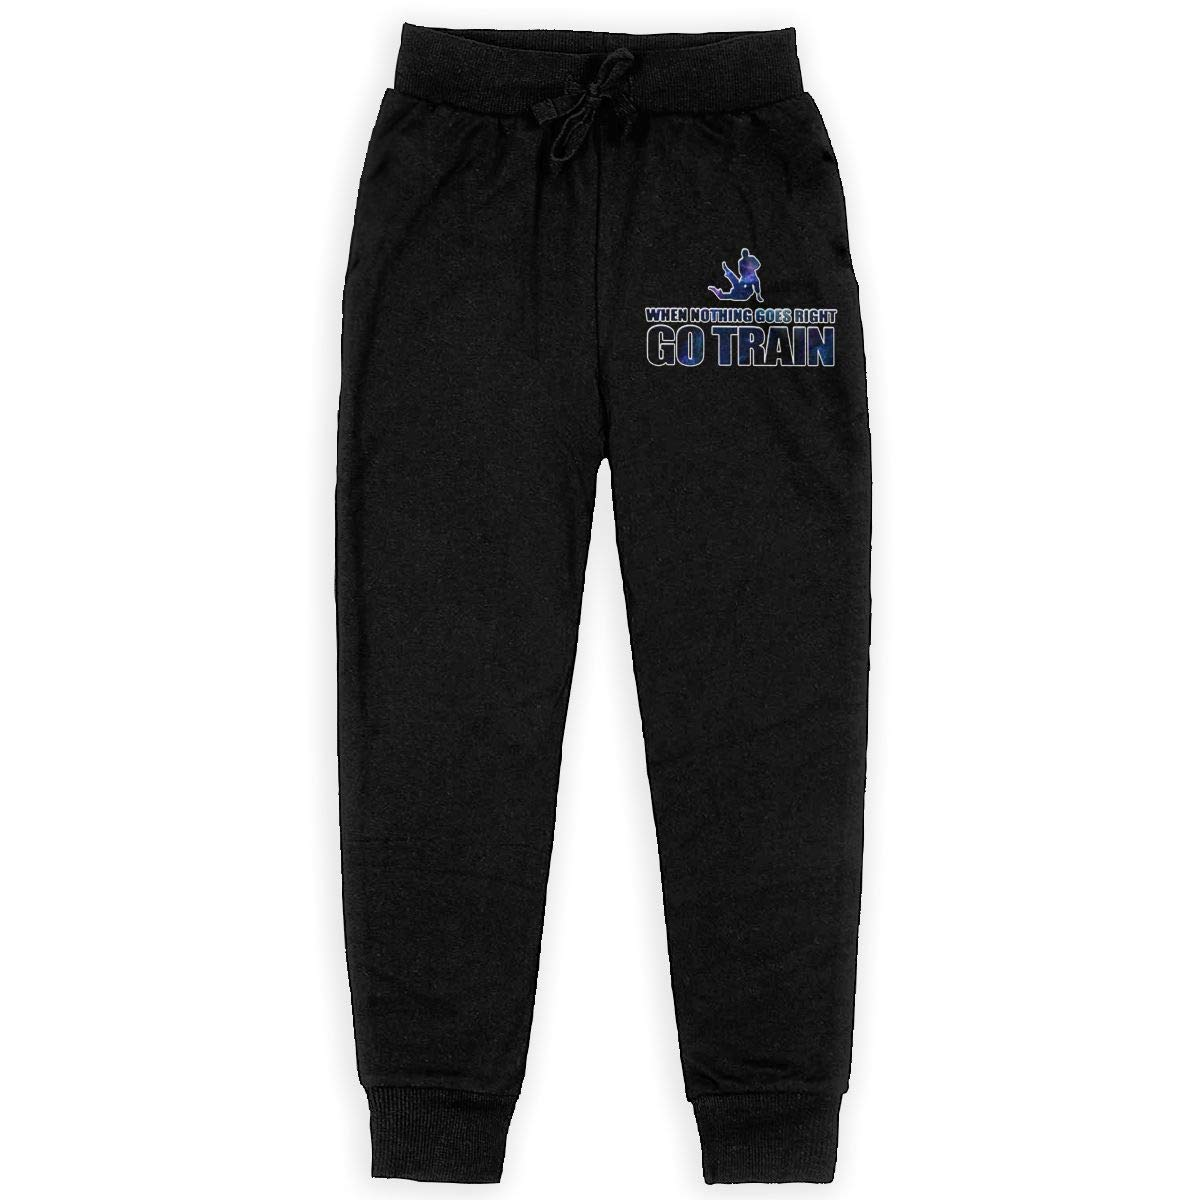 Joggers for Boys Bing4Bing Judo Jiu Jitsu is A Way of Life Kids Joggers Pants//Athletic Pants Comfortable Cotton Sweatpants